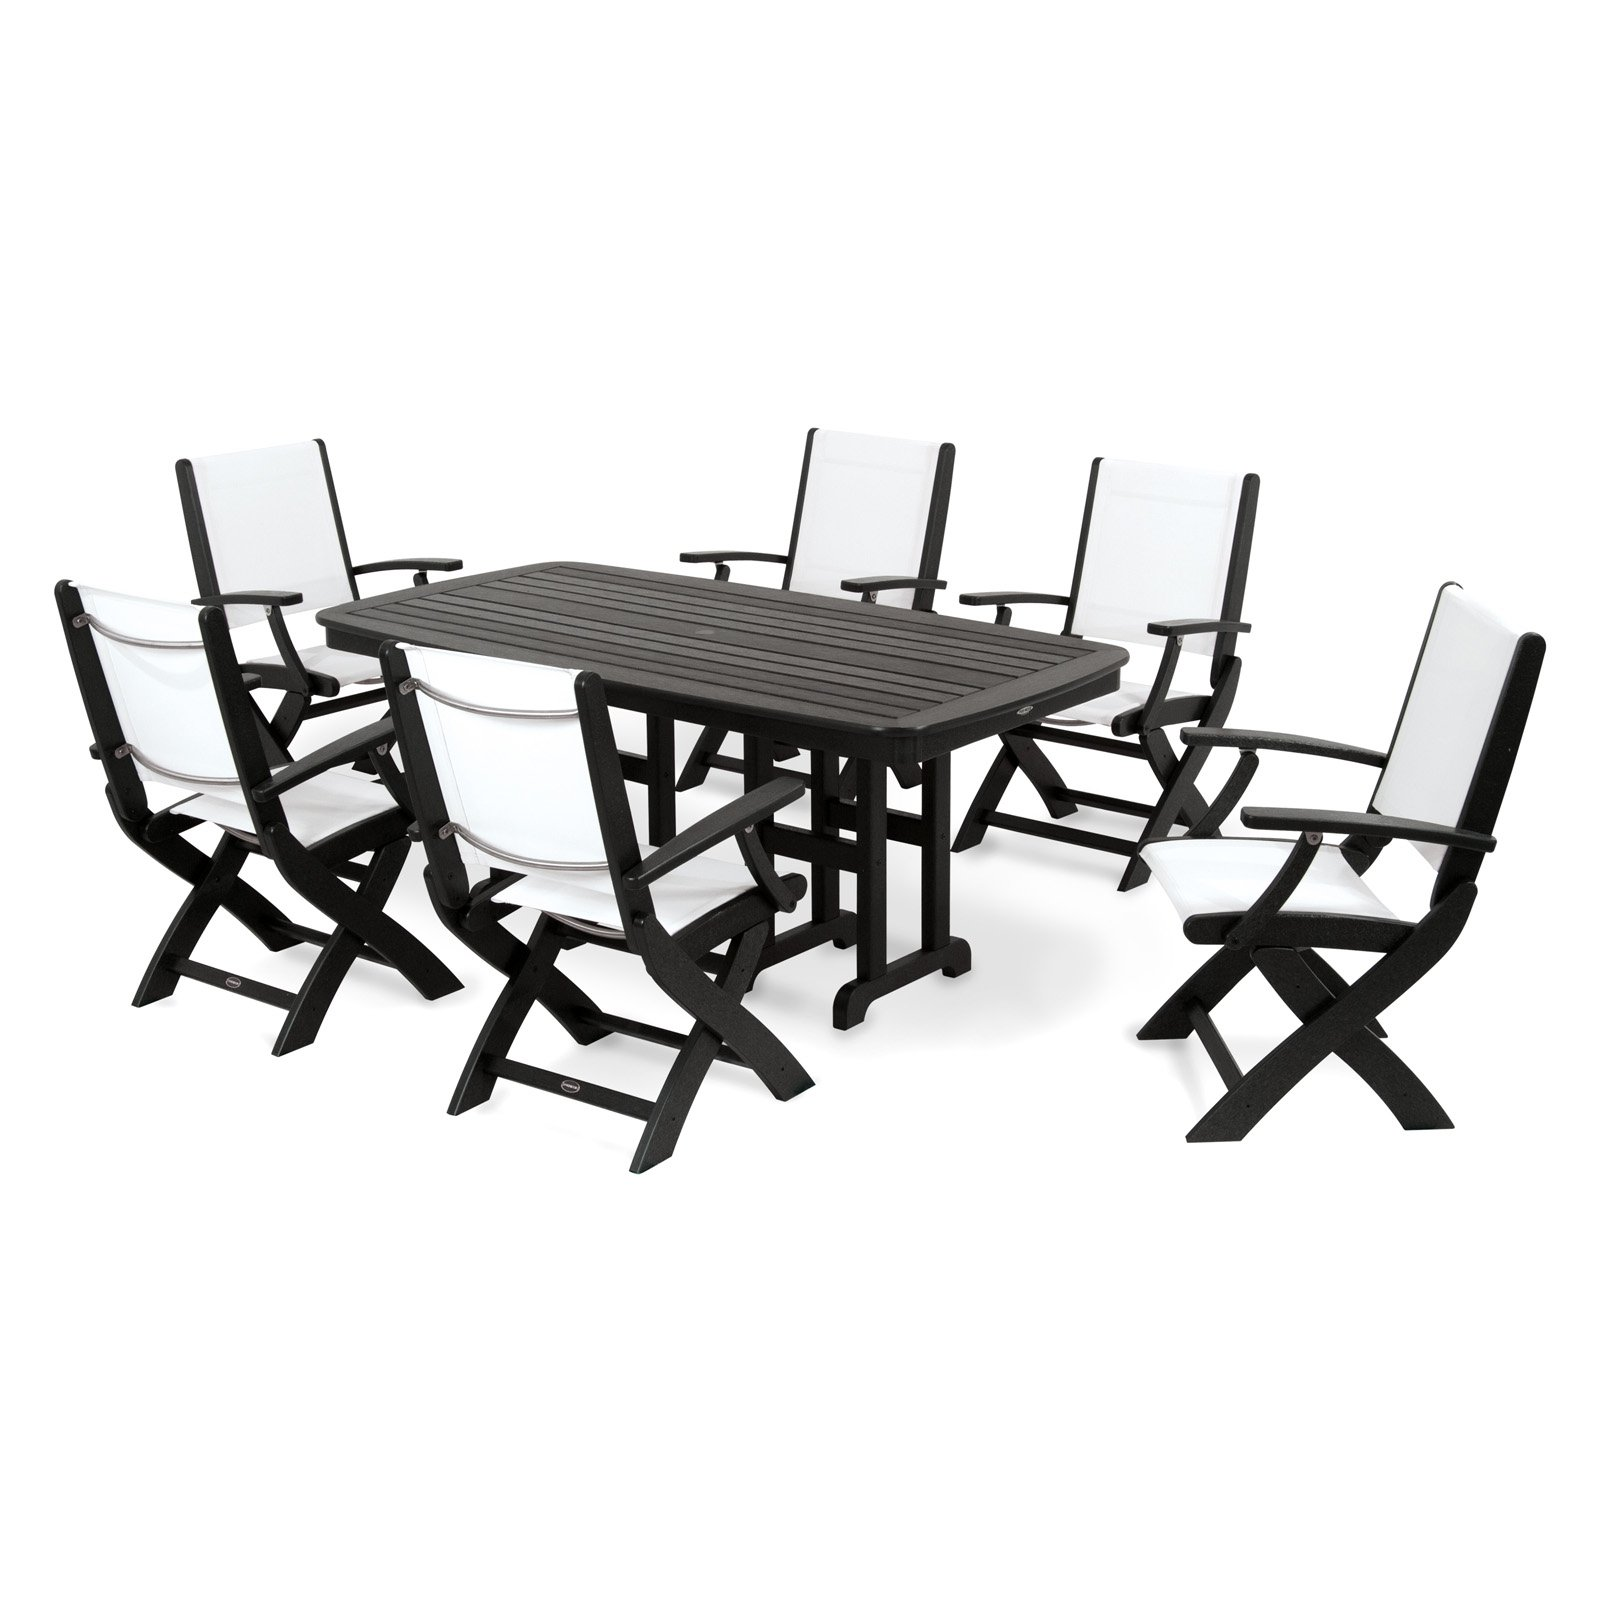 POLYWOOD® Coastal Sling Dining Set - Seats 6